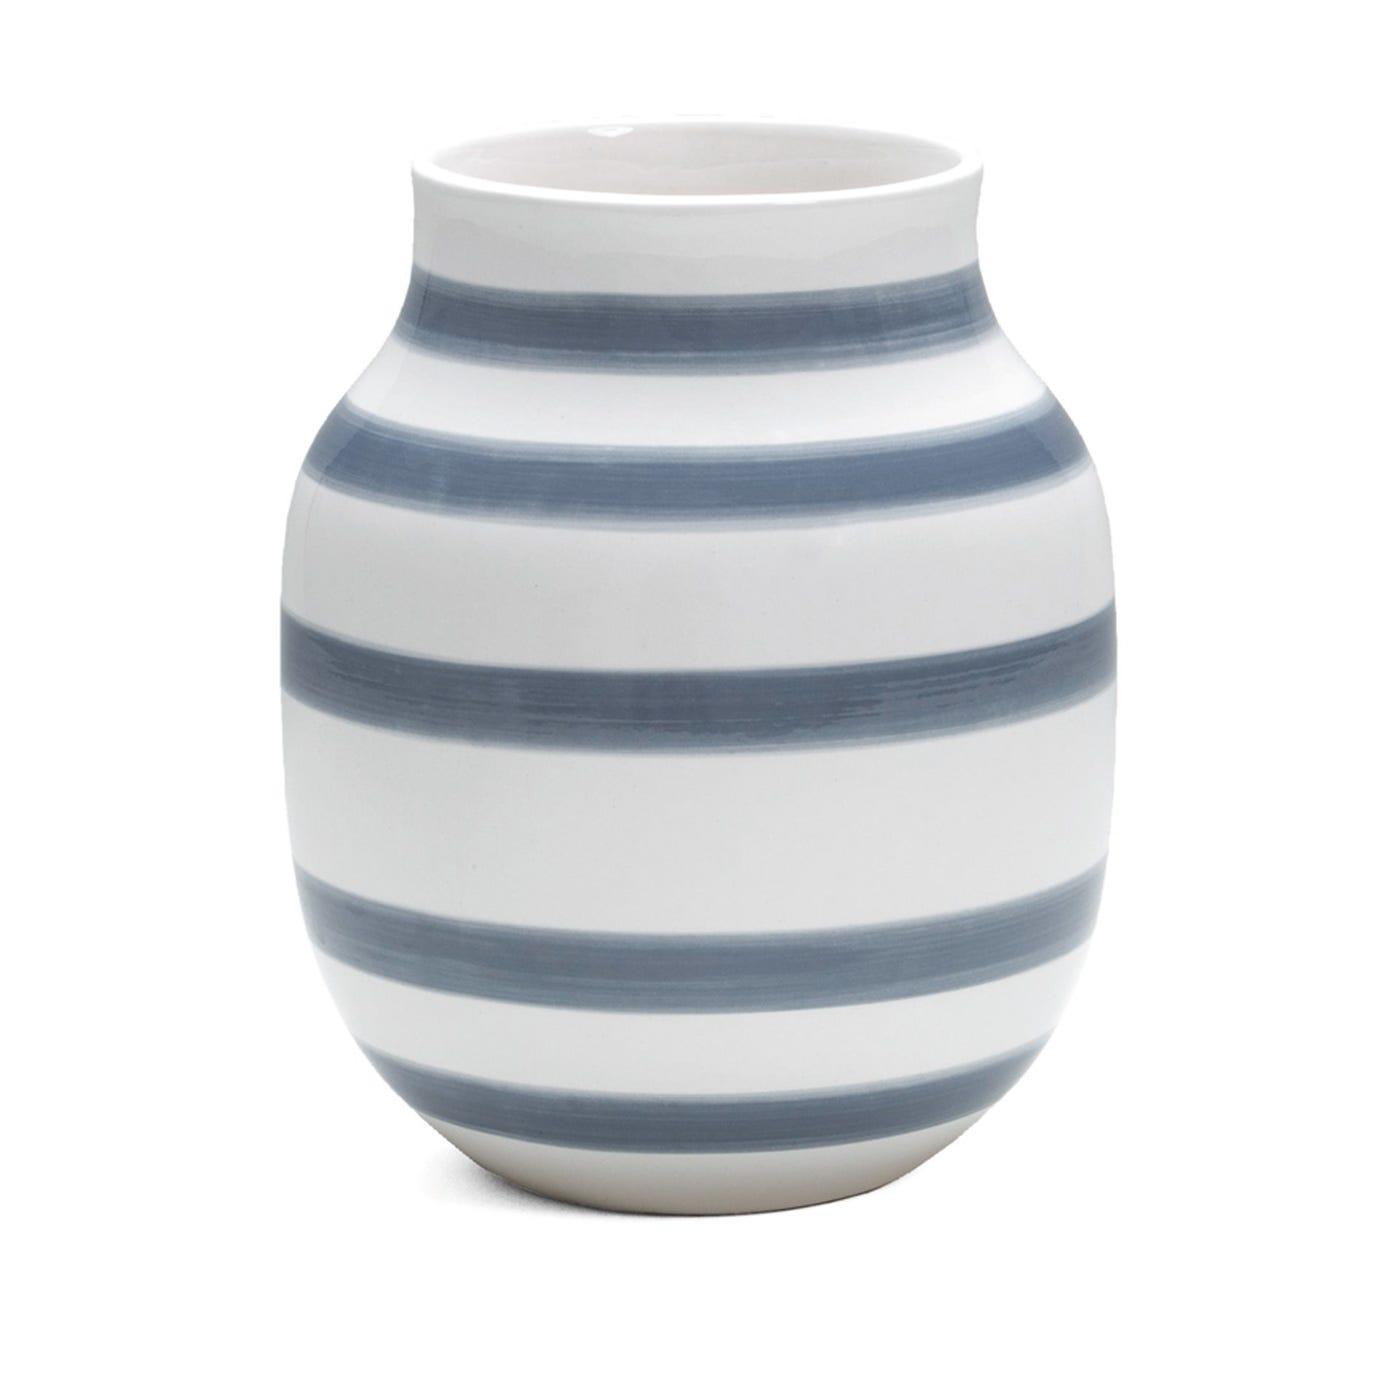 Omaggio Vase Medium Light Blue